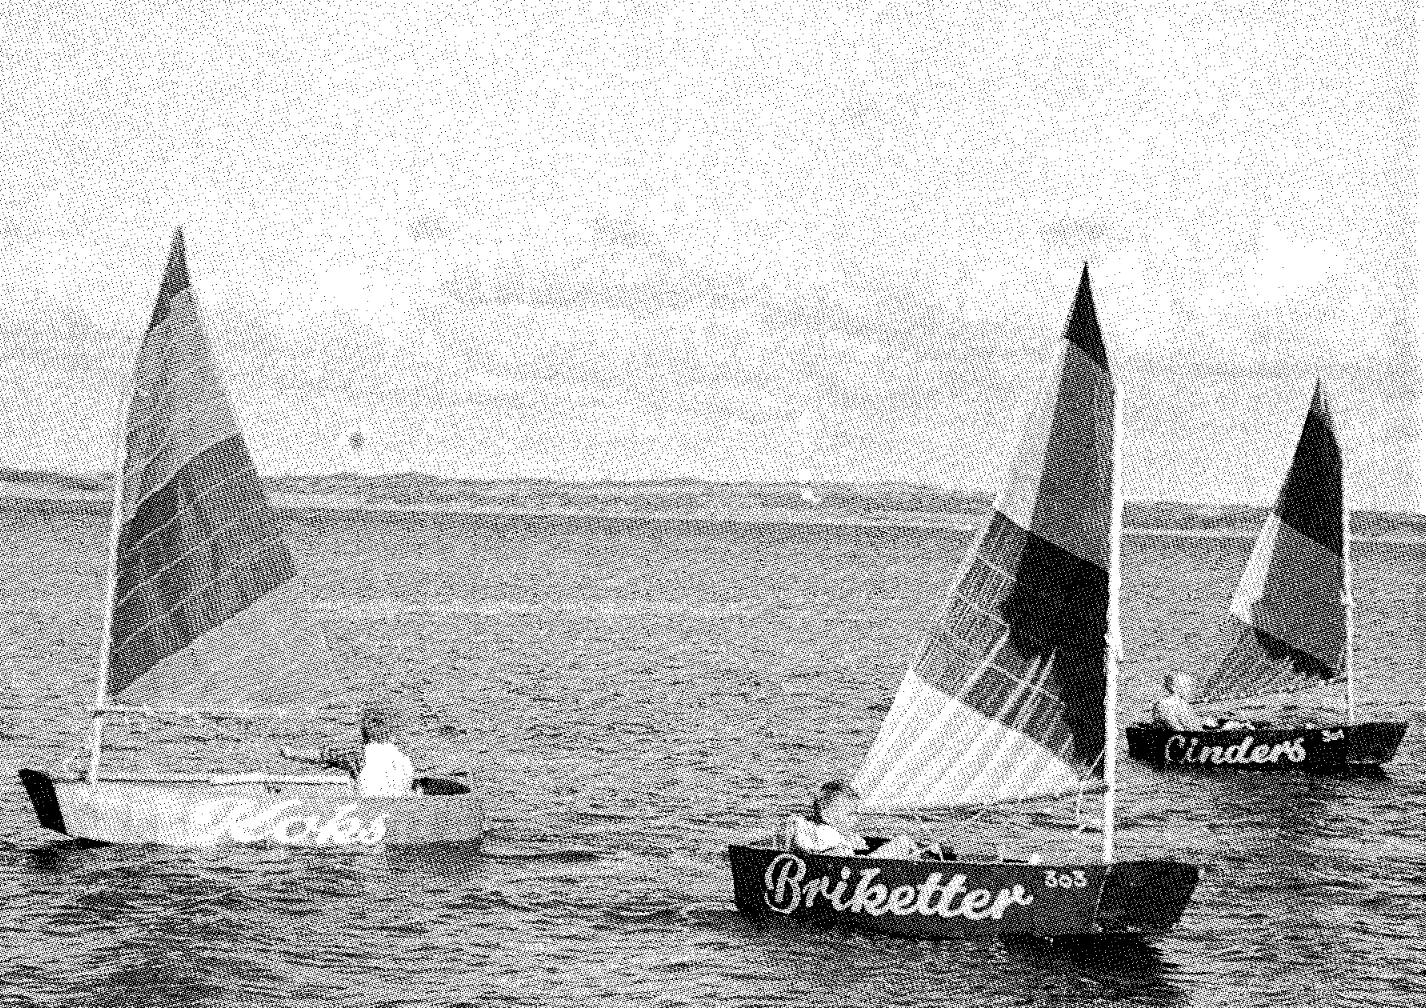 http://skivesejlklub.dk/wp-content/uploads/2019/03/Historie-optimisterne.png